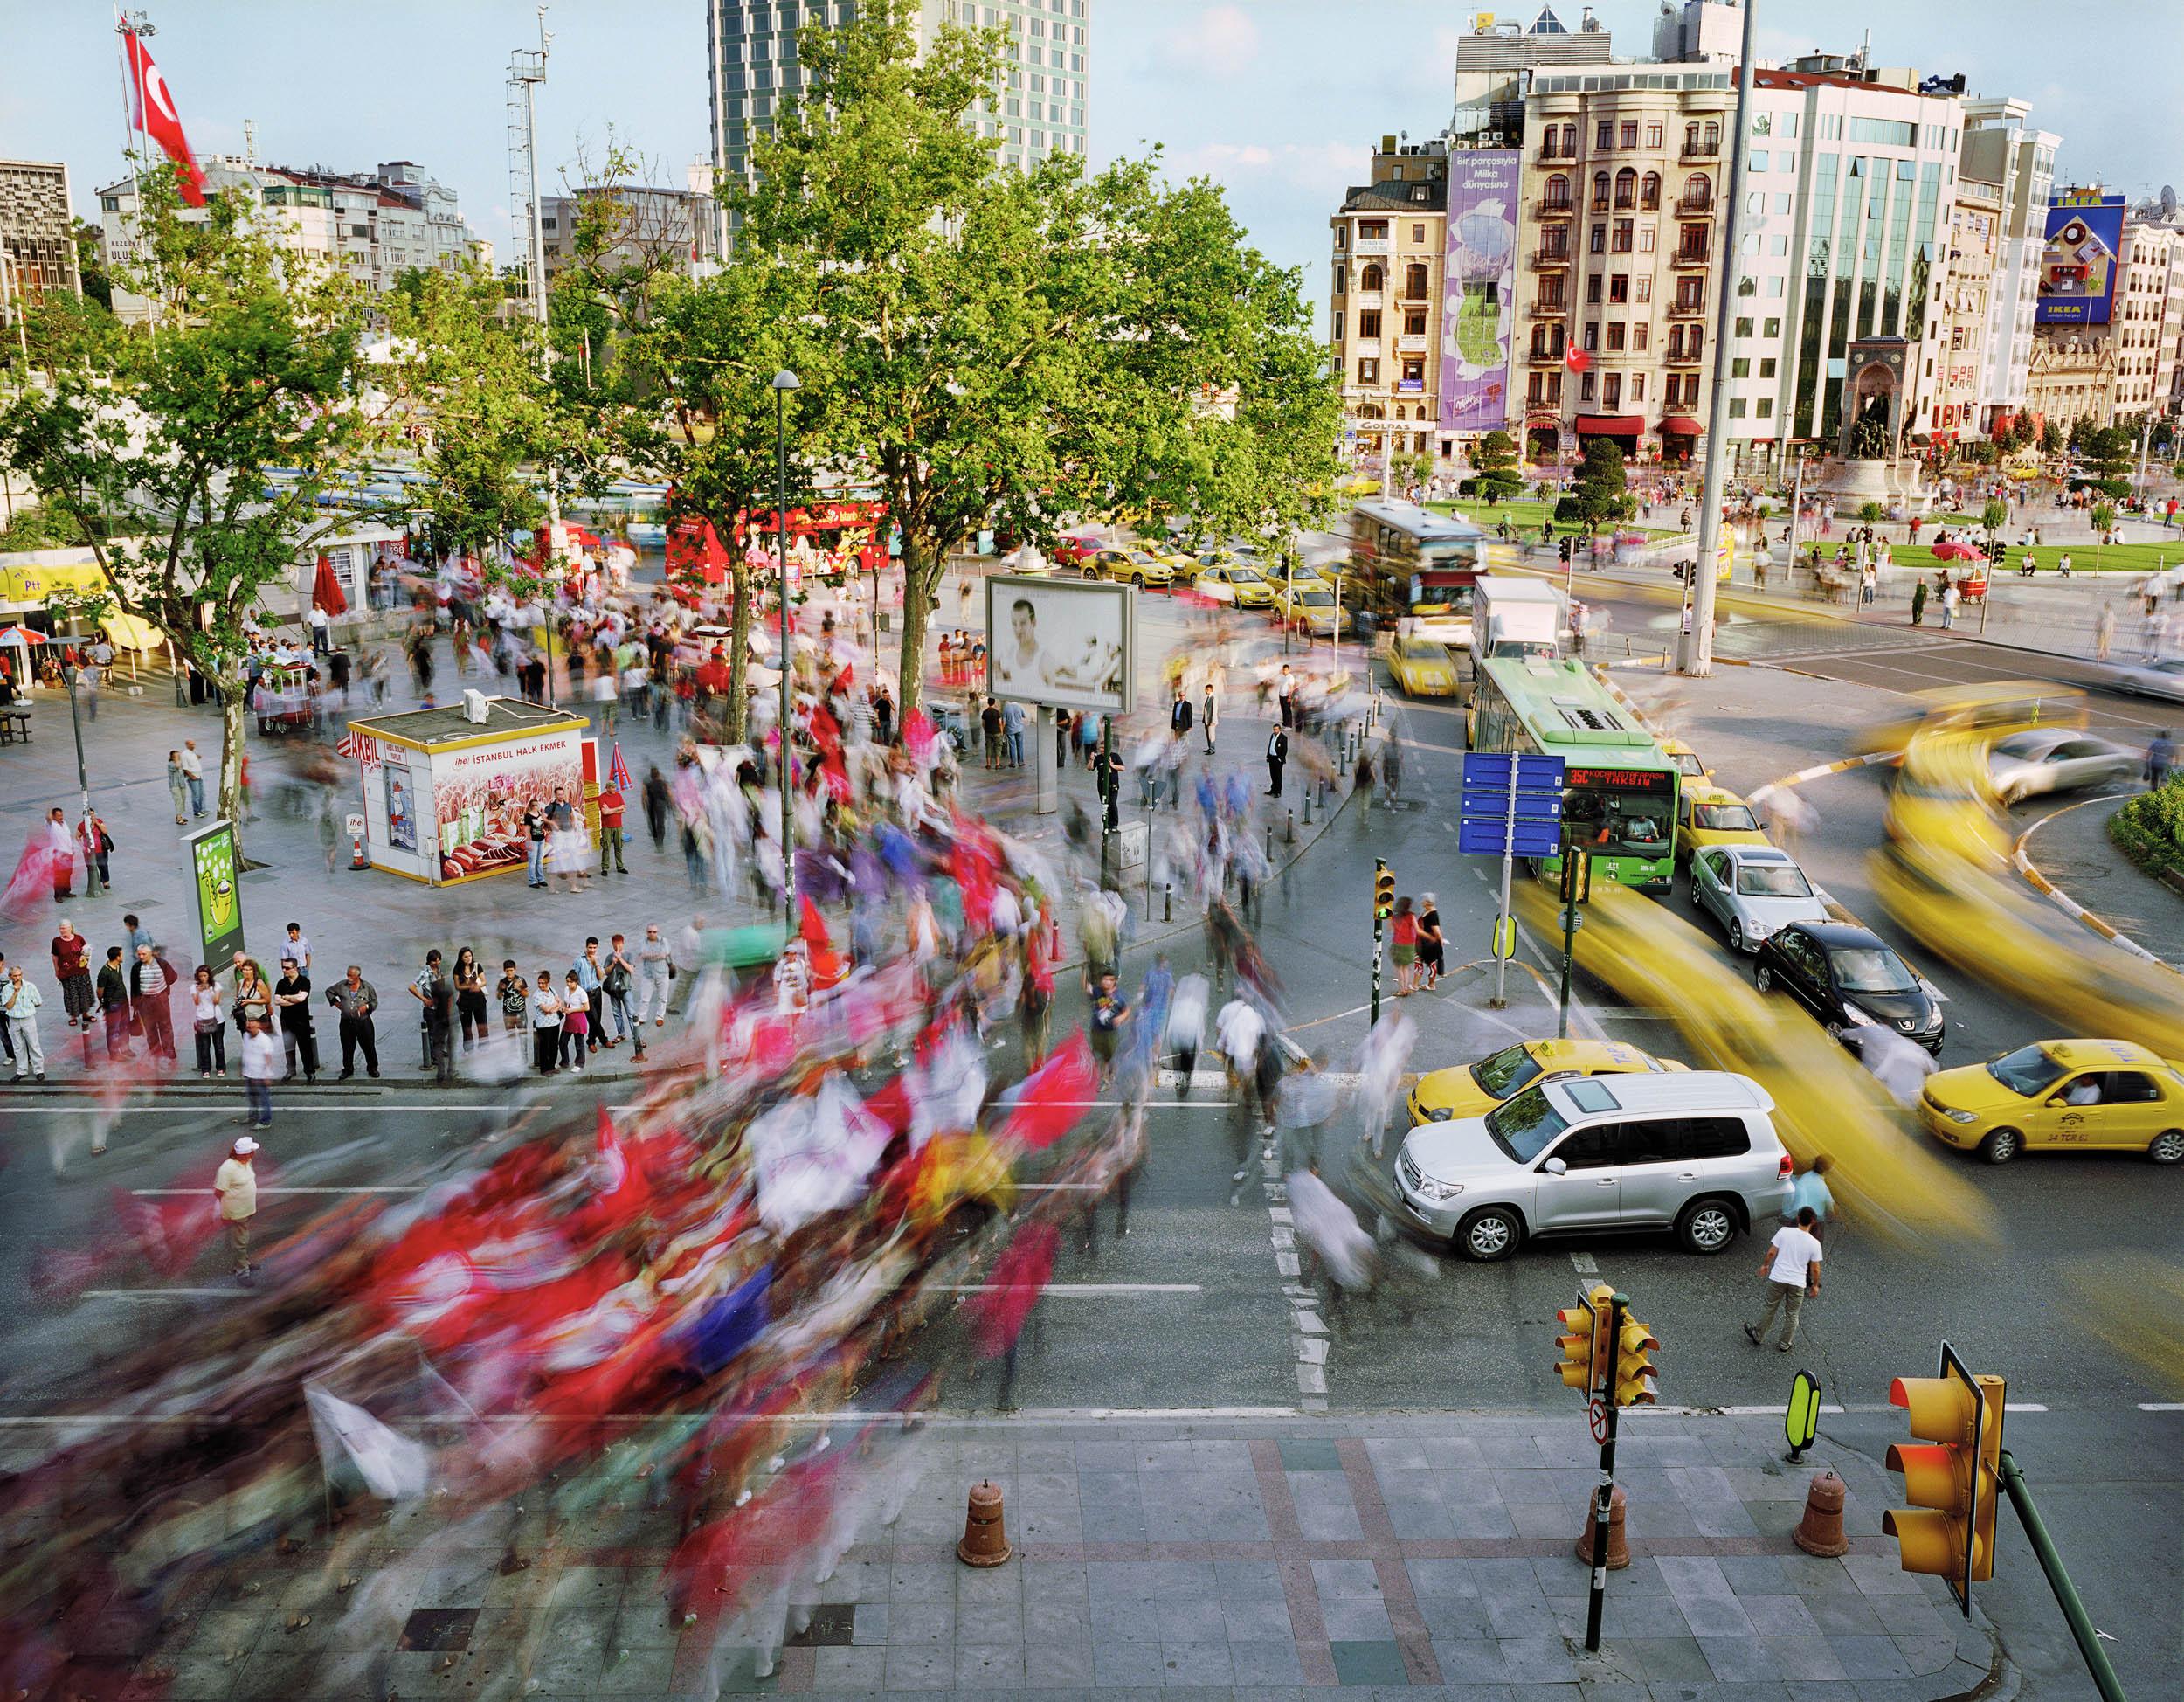 Taksim Meydani, Beyoglu, Istanbul, Turkey (political demonstration)